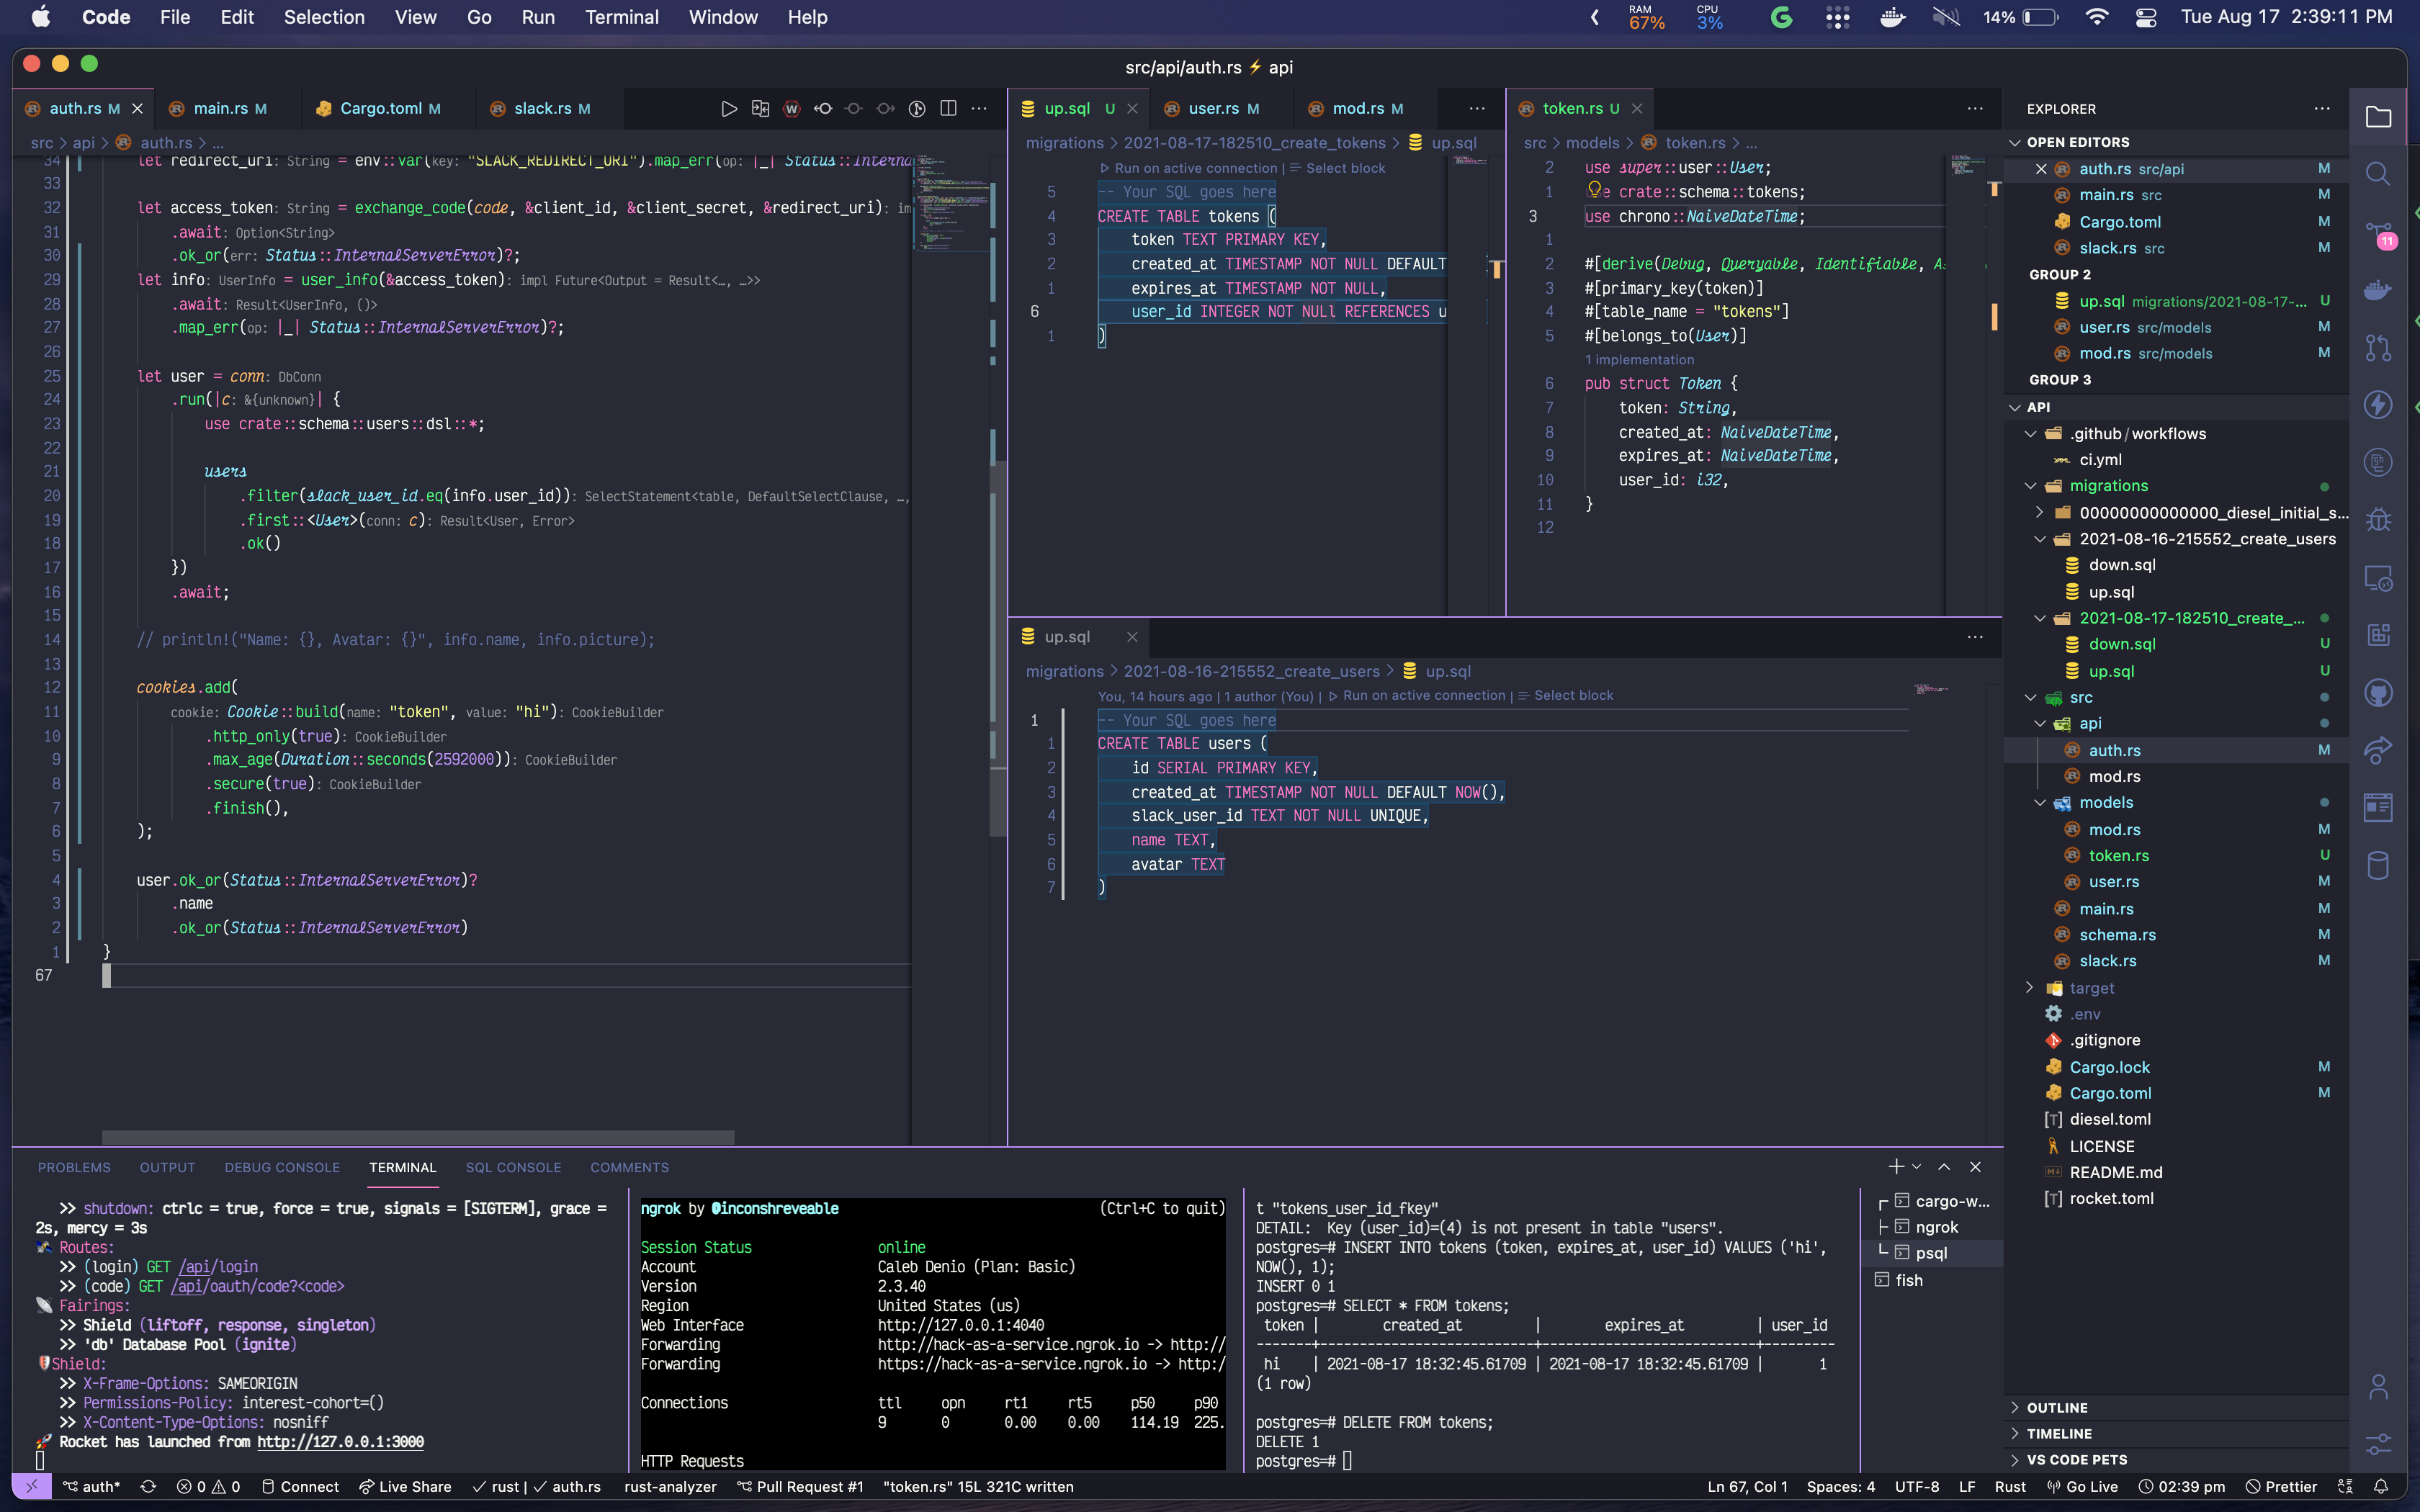 https://cloud-mn5xb7s02-hack-club-bot.vercel.app/0screen_shot_2021-08-17_at_2.39.11_pm.png